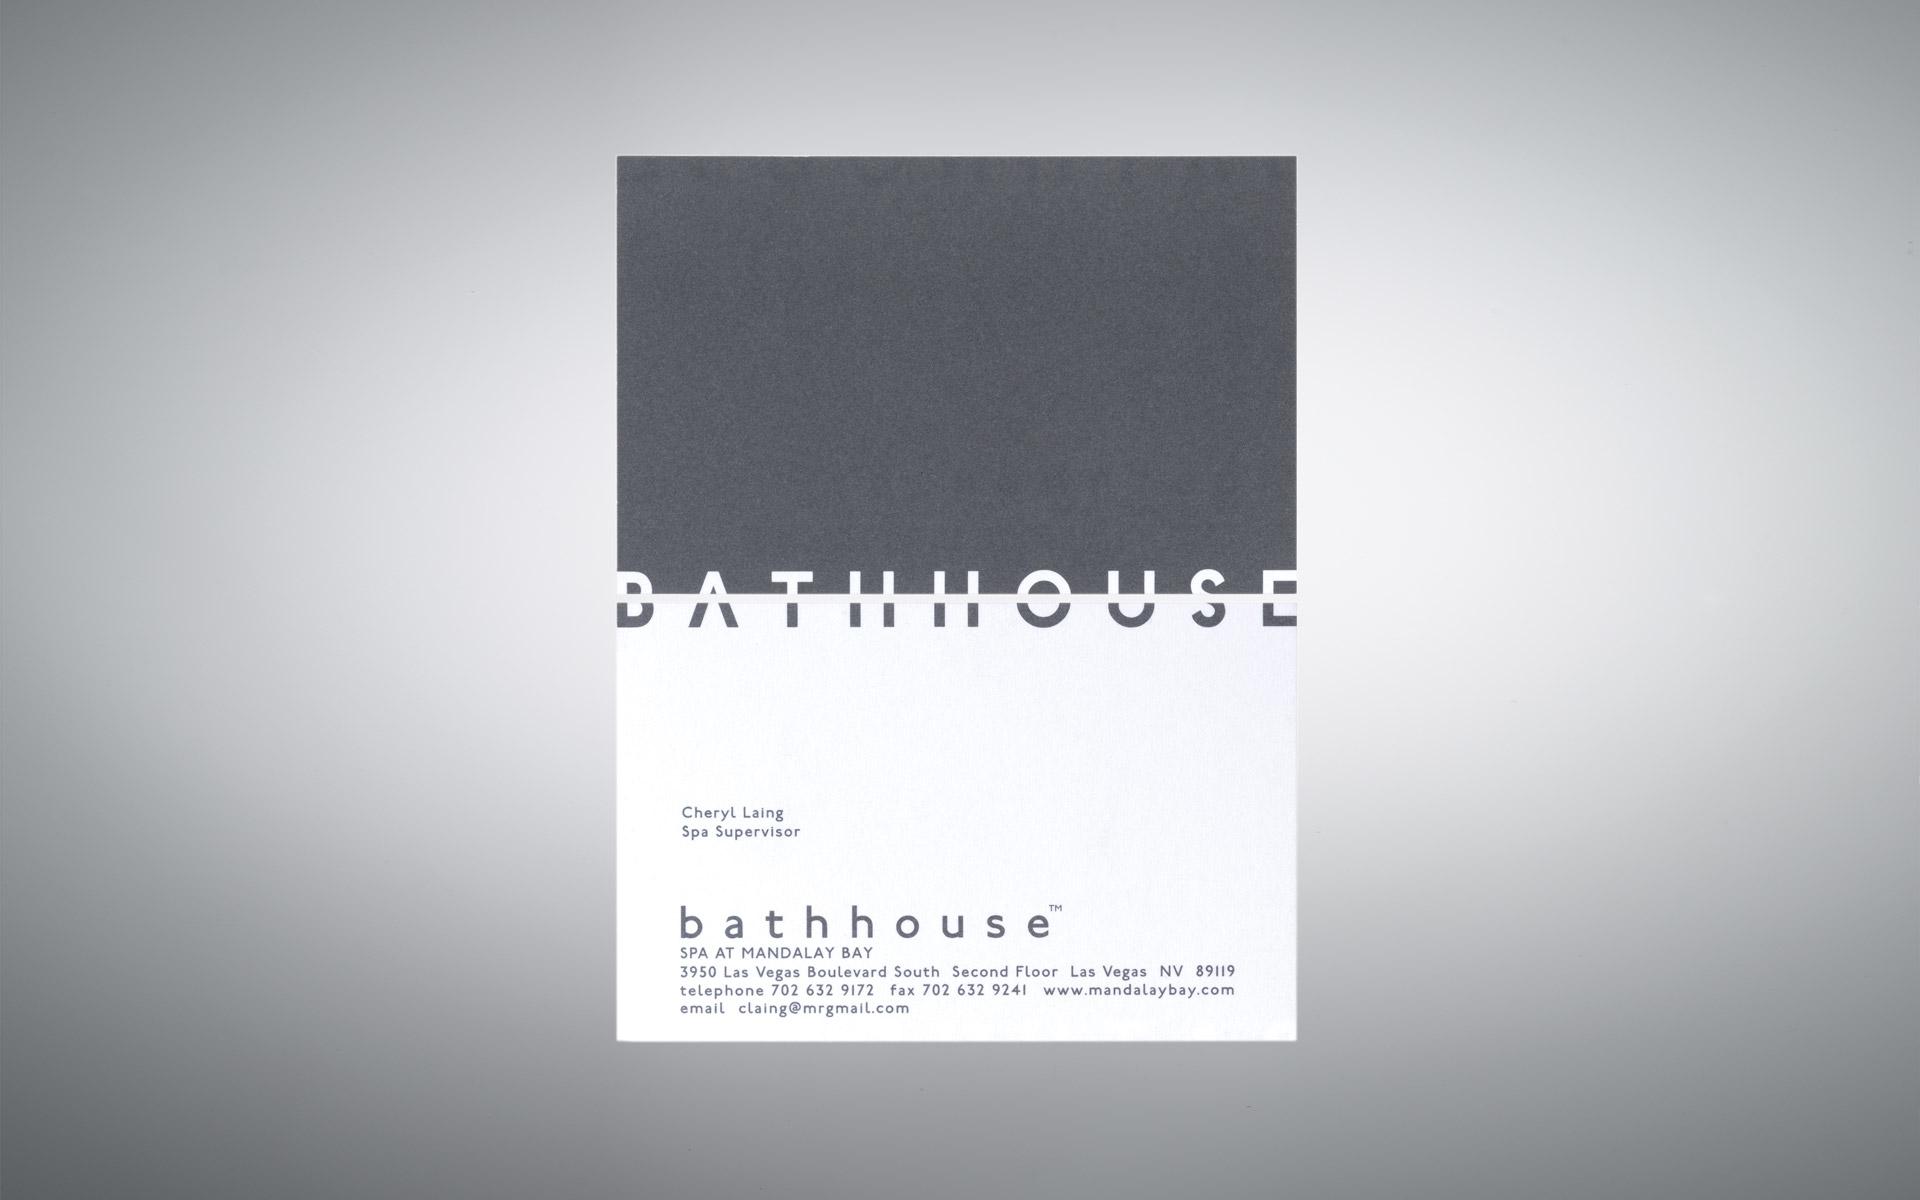 20150102-Bathhouse-8.jpg